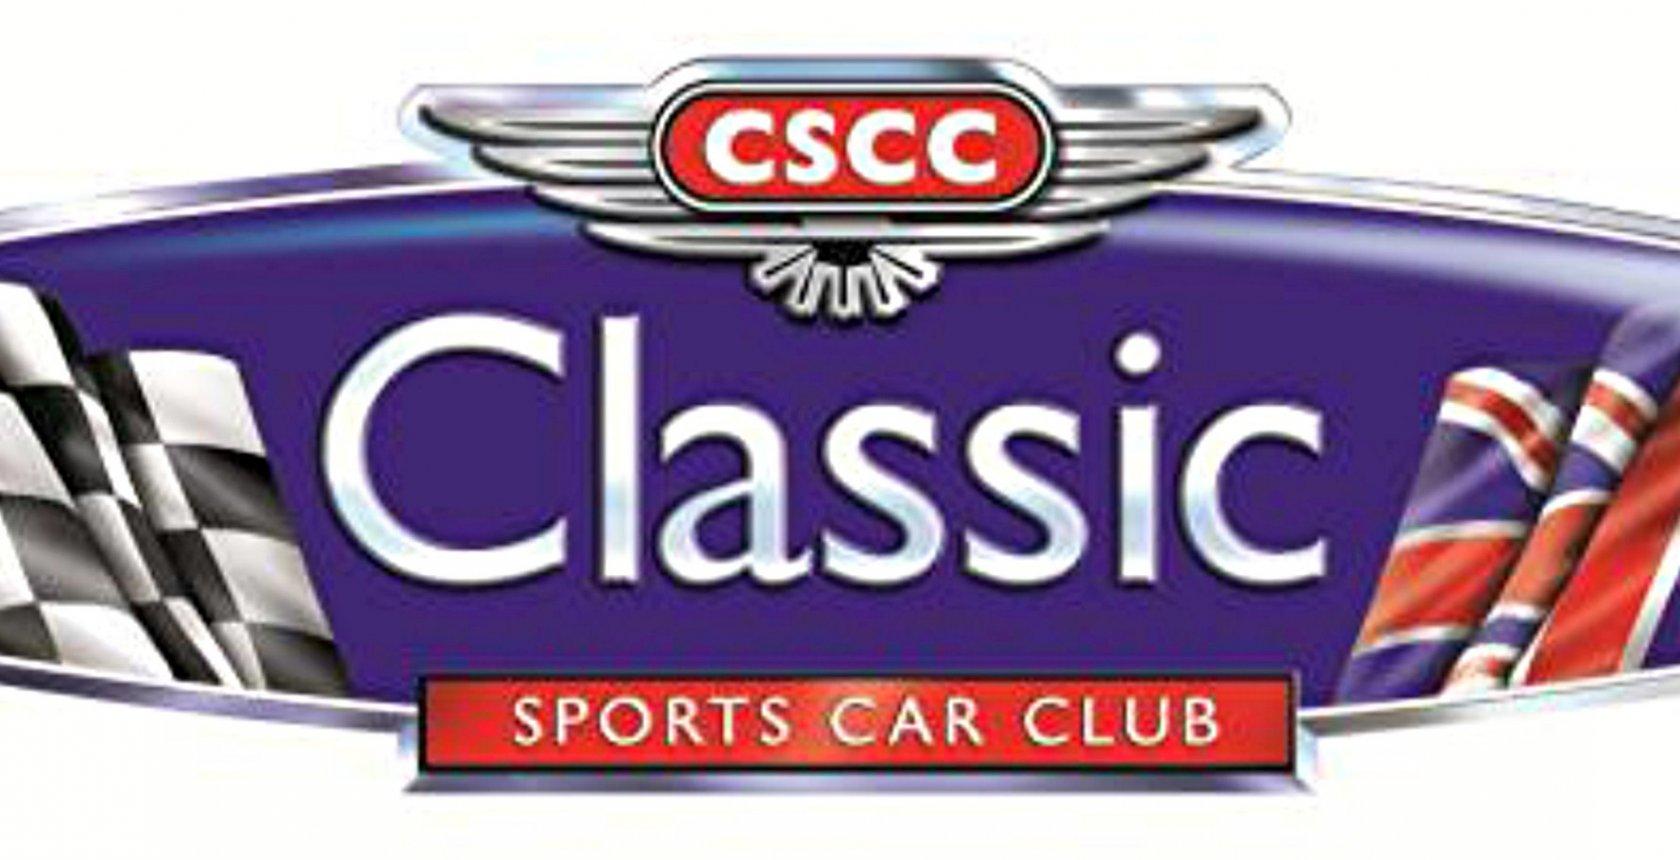 Cscc Logo